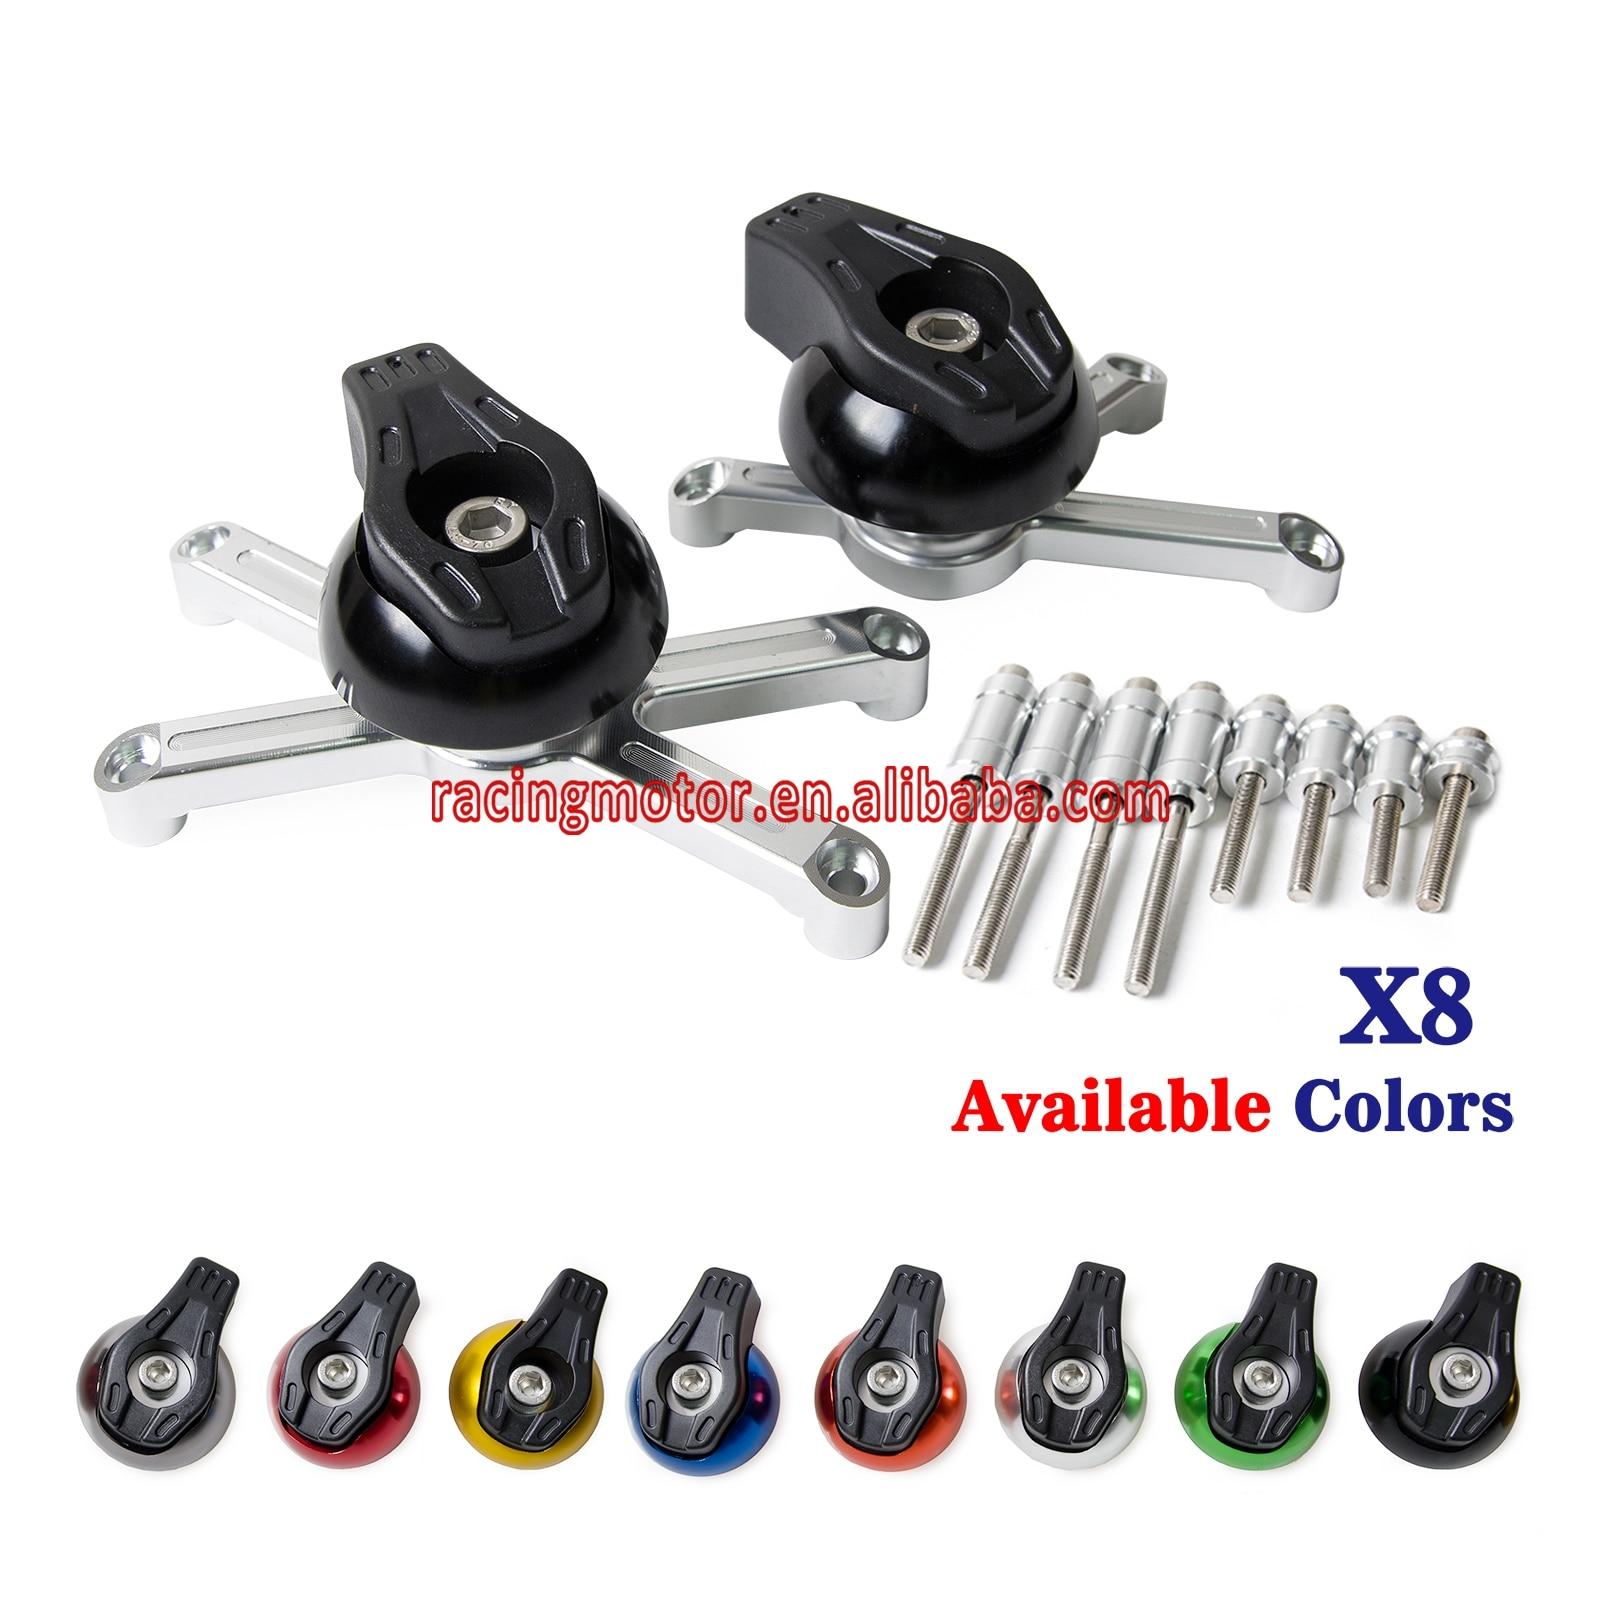 ЧПУ алюминиевая рама ползунки краш колодки протектор для Suzuki GSXR600 GSXR750 2006-2012 2006-2011 системы GSX-r600 о системы GSX-750 Рандов